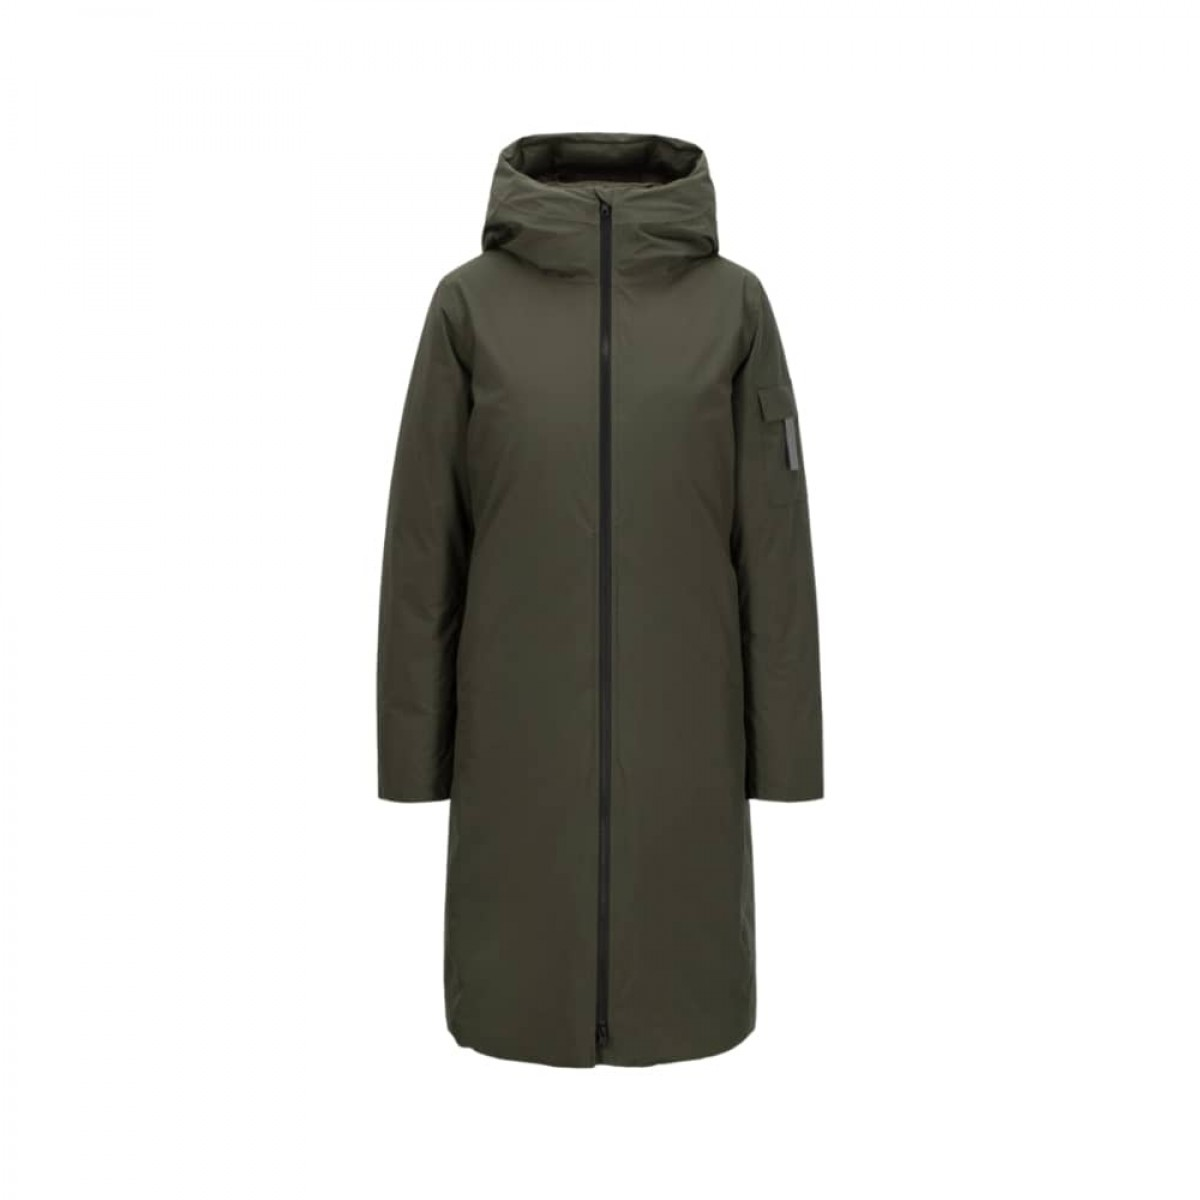 bjorli jacket - green - front